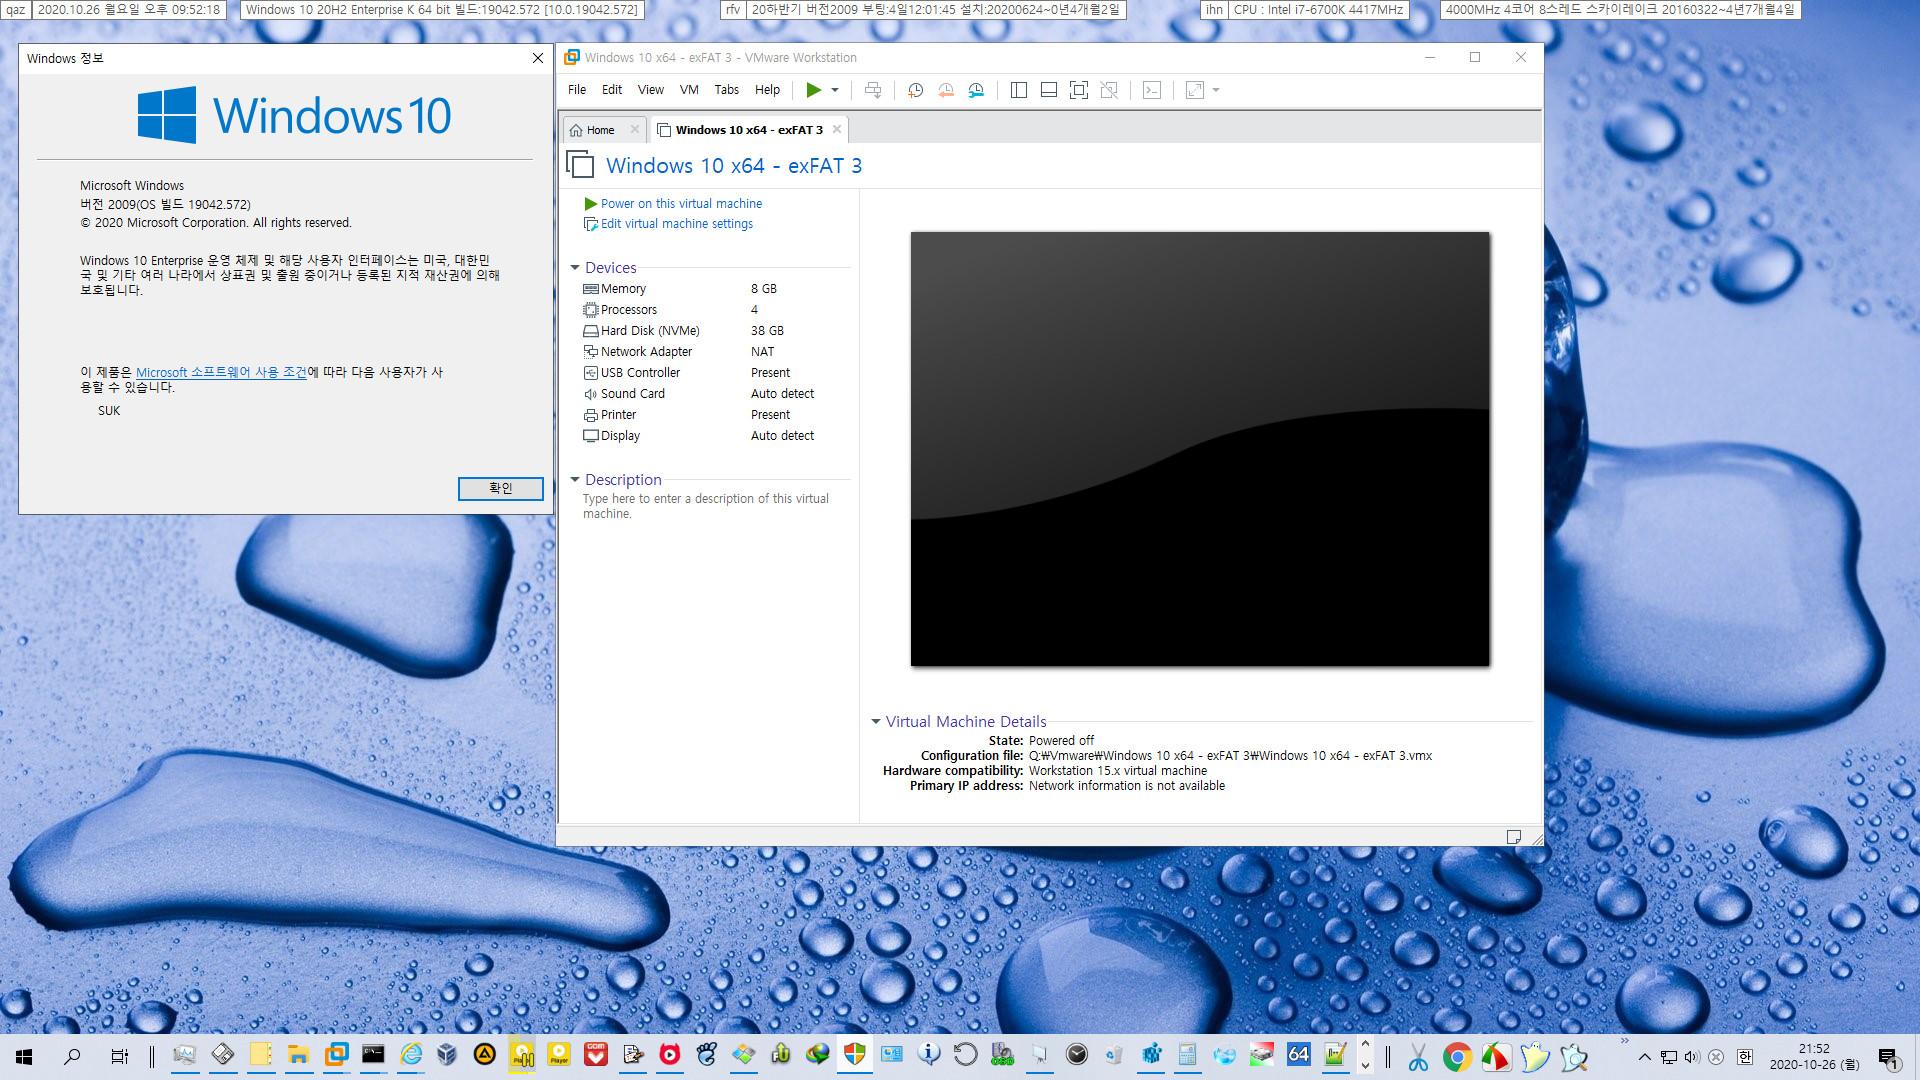 exFAT 포맷으로도 VHD 부팅이 Windows 10 버전 1903부터 된다고 하여 테스트 - 완전 생고생 했습니다 2020-10-26_215218.jpg